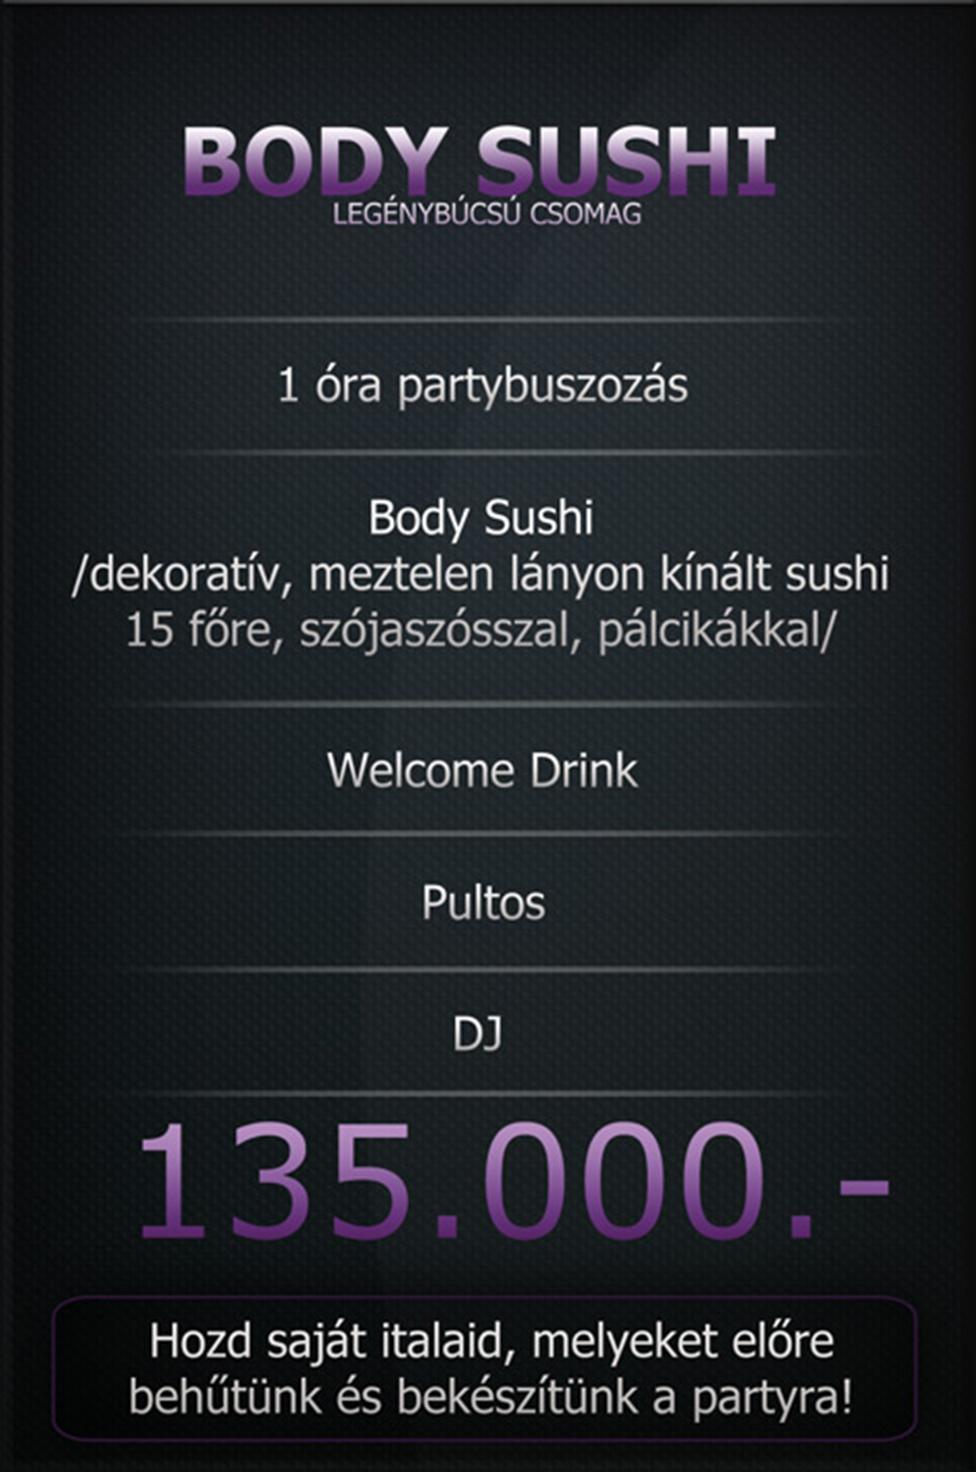 Body Sushi legénybúcsú